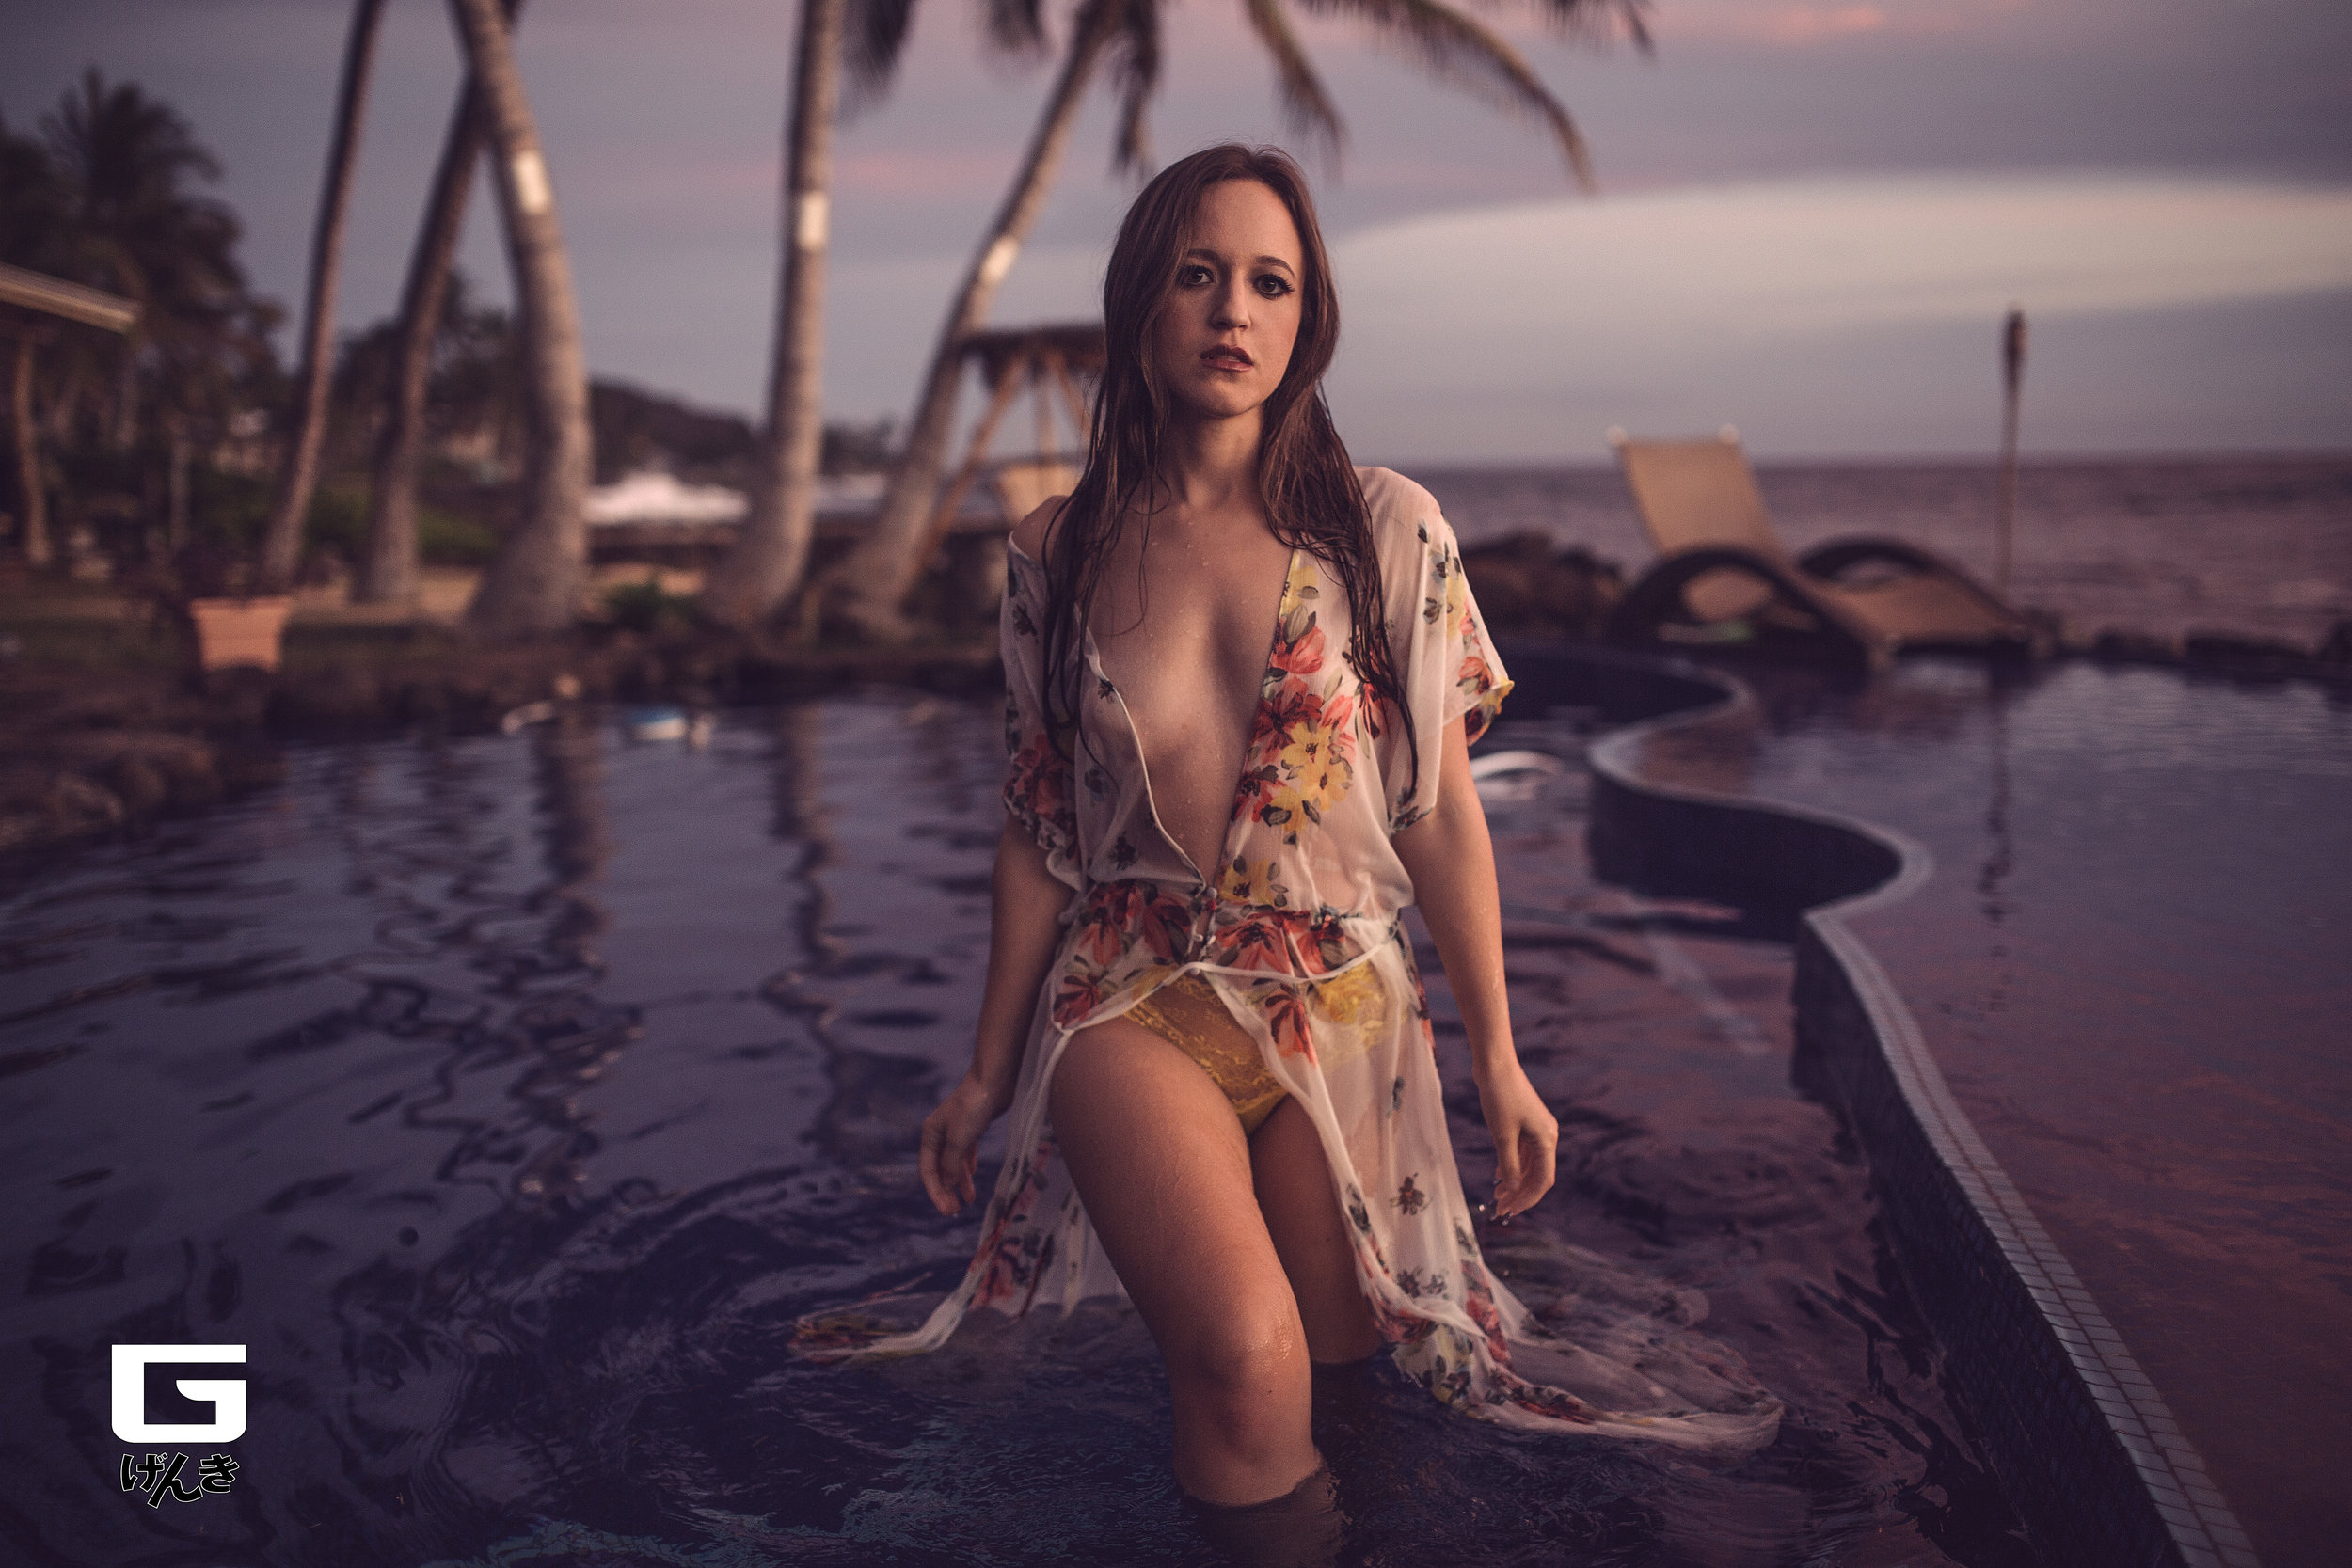 Hawai'i photographer, Oahu photographer, honolulu photographer, genkiphotos, genkimedia, creative photography Hawaii models, Hawaii Bikini, Hawaii Nature, Hawaii Sunset, love yourself, Body positivity